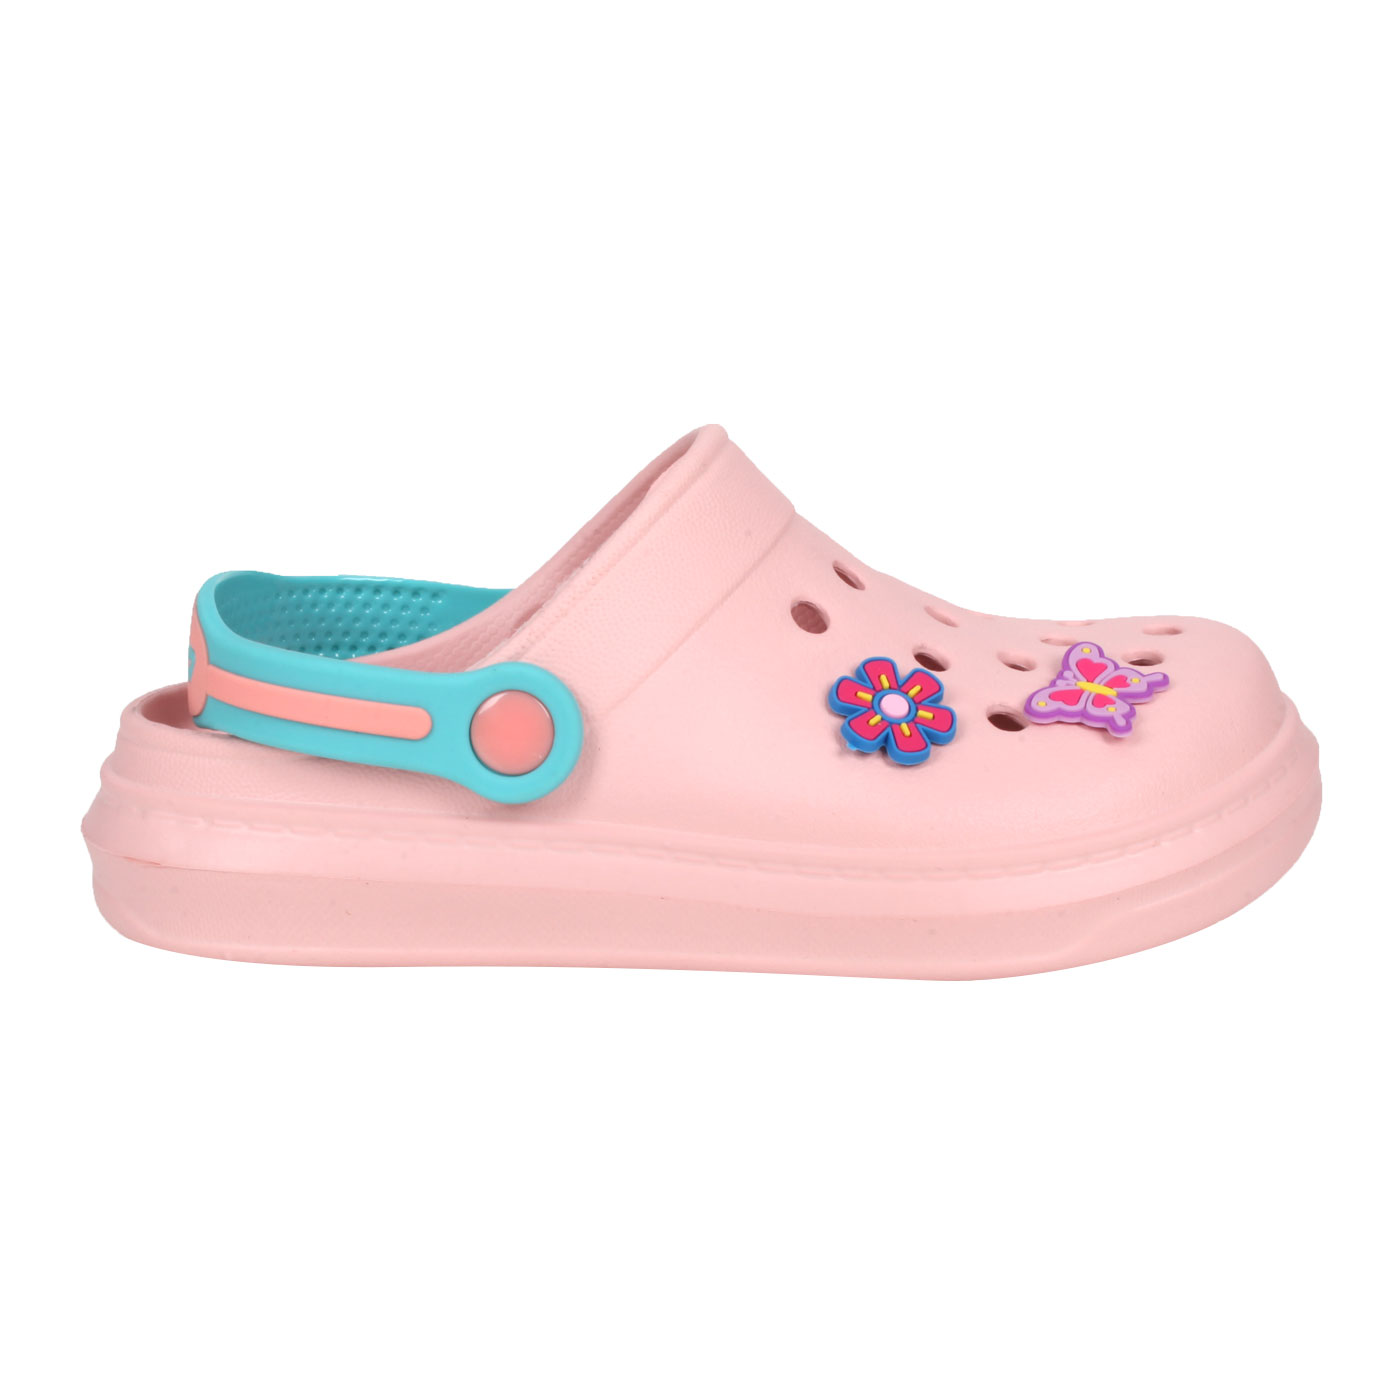 LOTTO 中童FANO清涼拖鞋 LT1AKS3083 - 粉紅綠紫藍